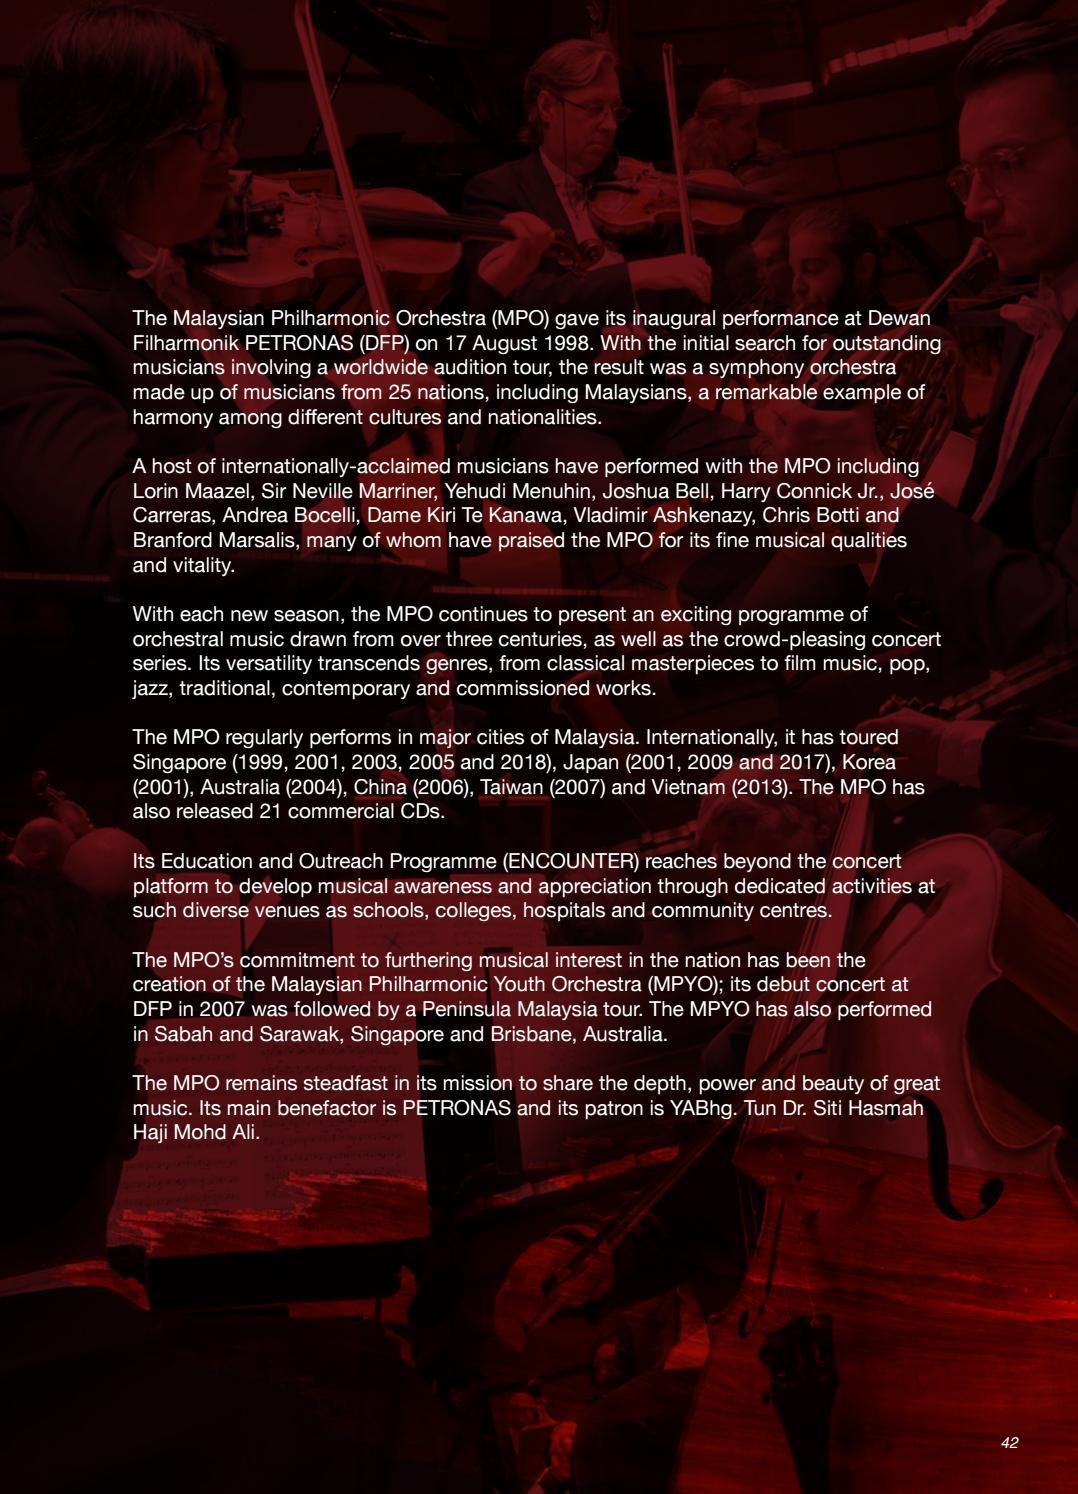 MPO 2019 SEASON BROCHURE by Malaysian Philharmonic Orchestra - issuu